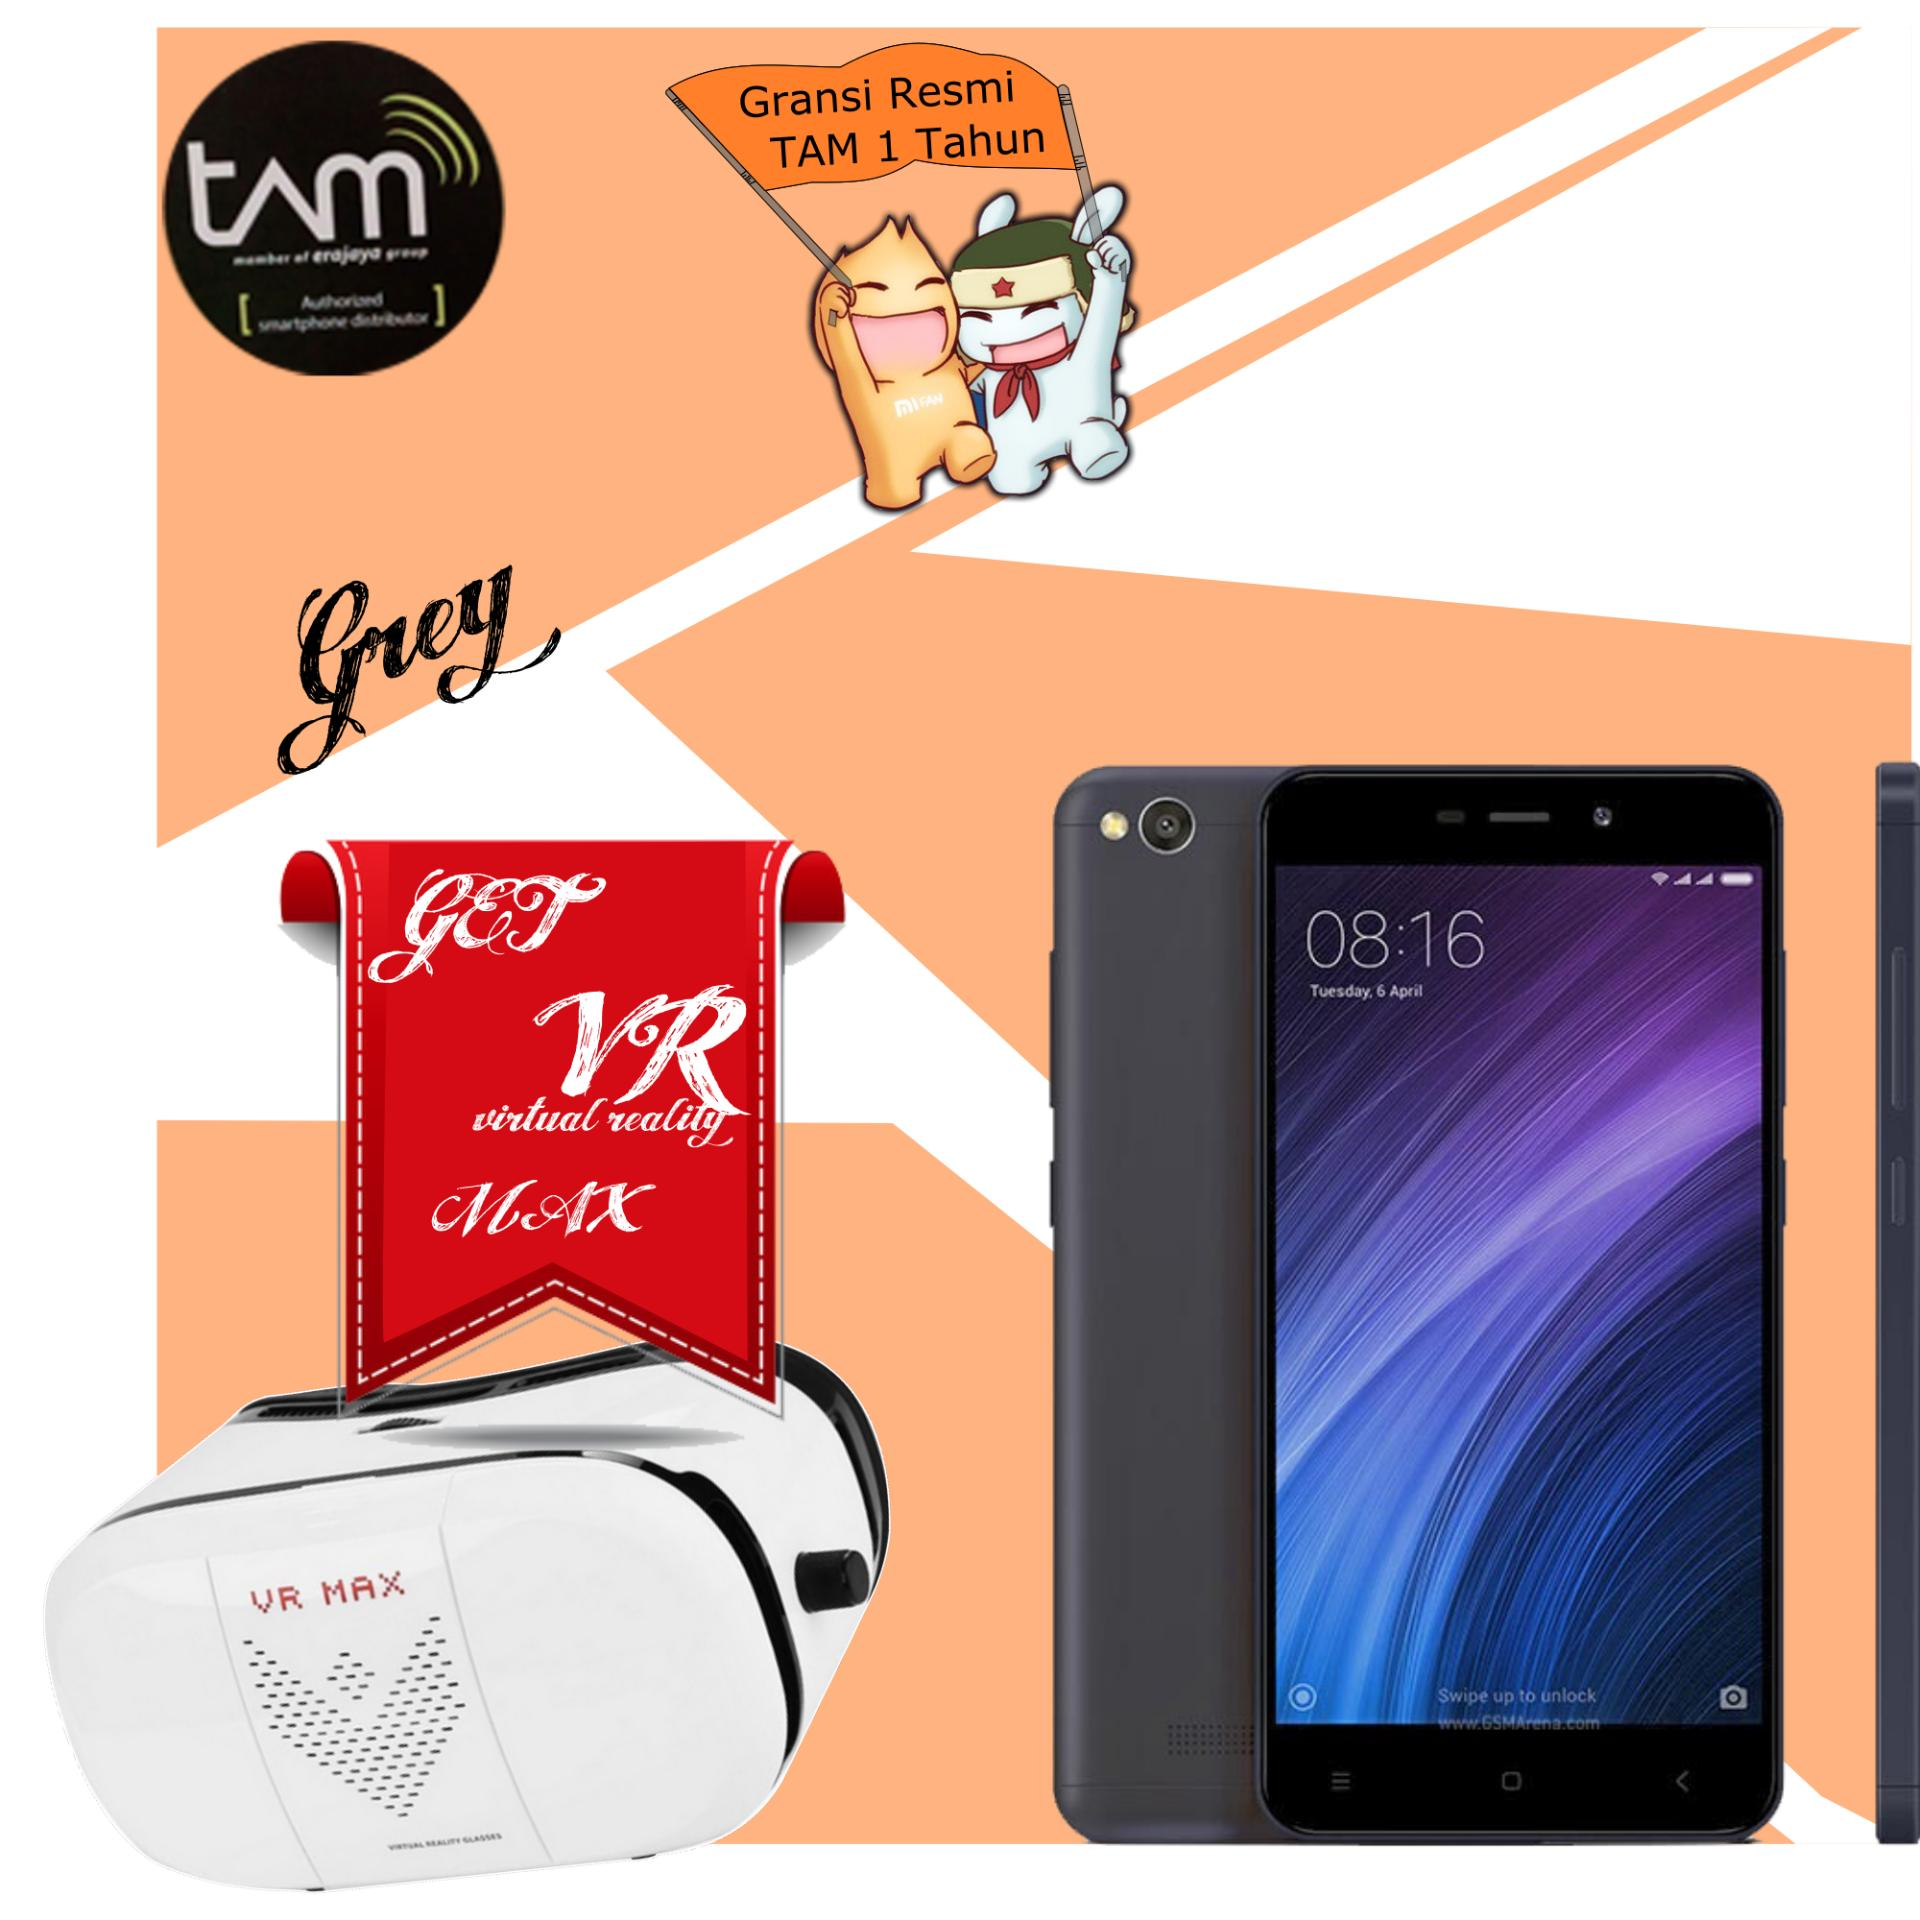 Anggaran Terbaik Xiaomi Redmi 4a 2gb 32gb 4g Lte Grey Garansi 4x Prime Resmi Tam 1 Tahun